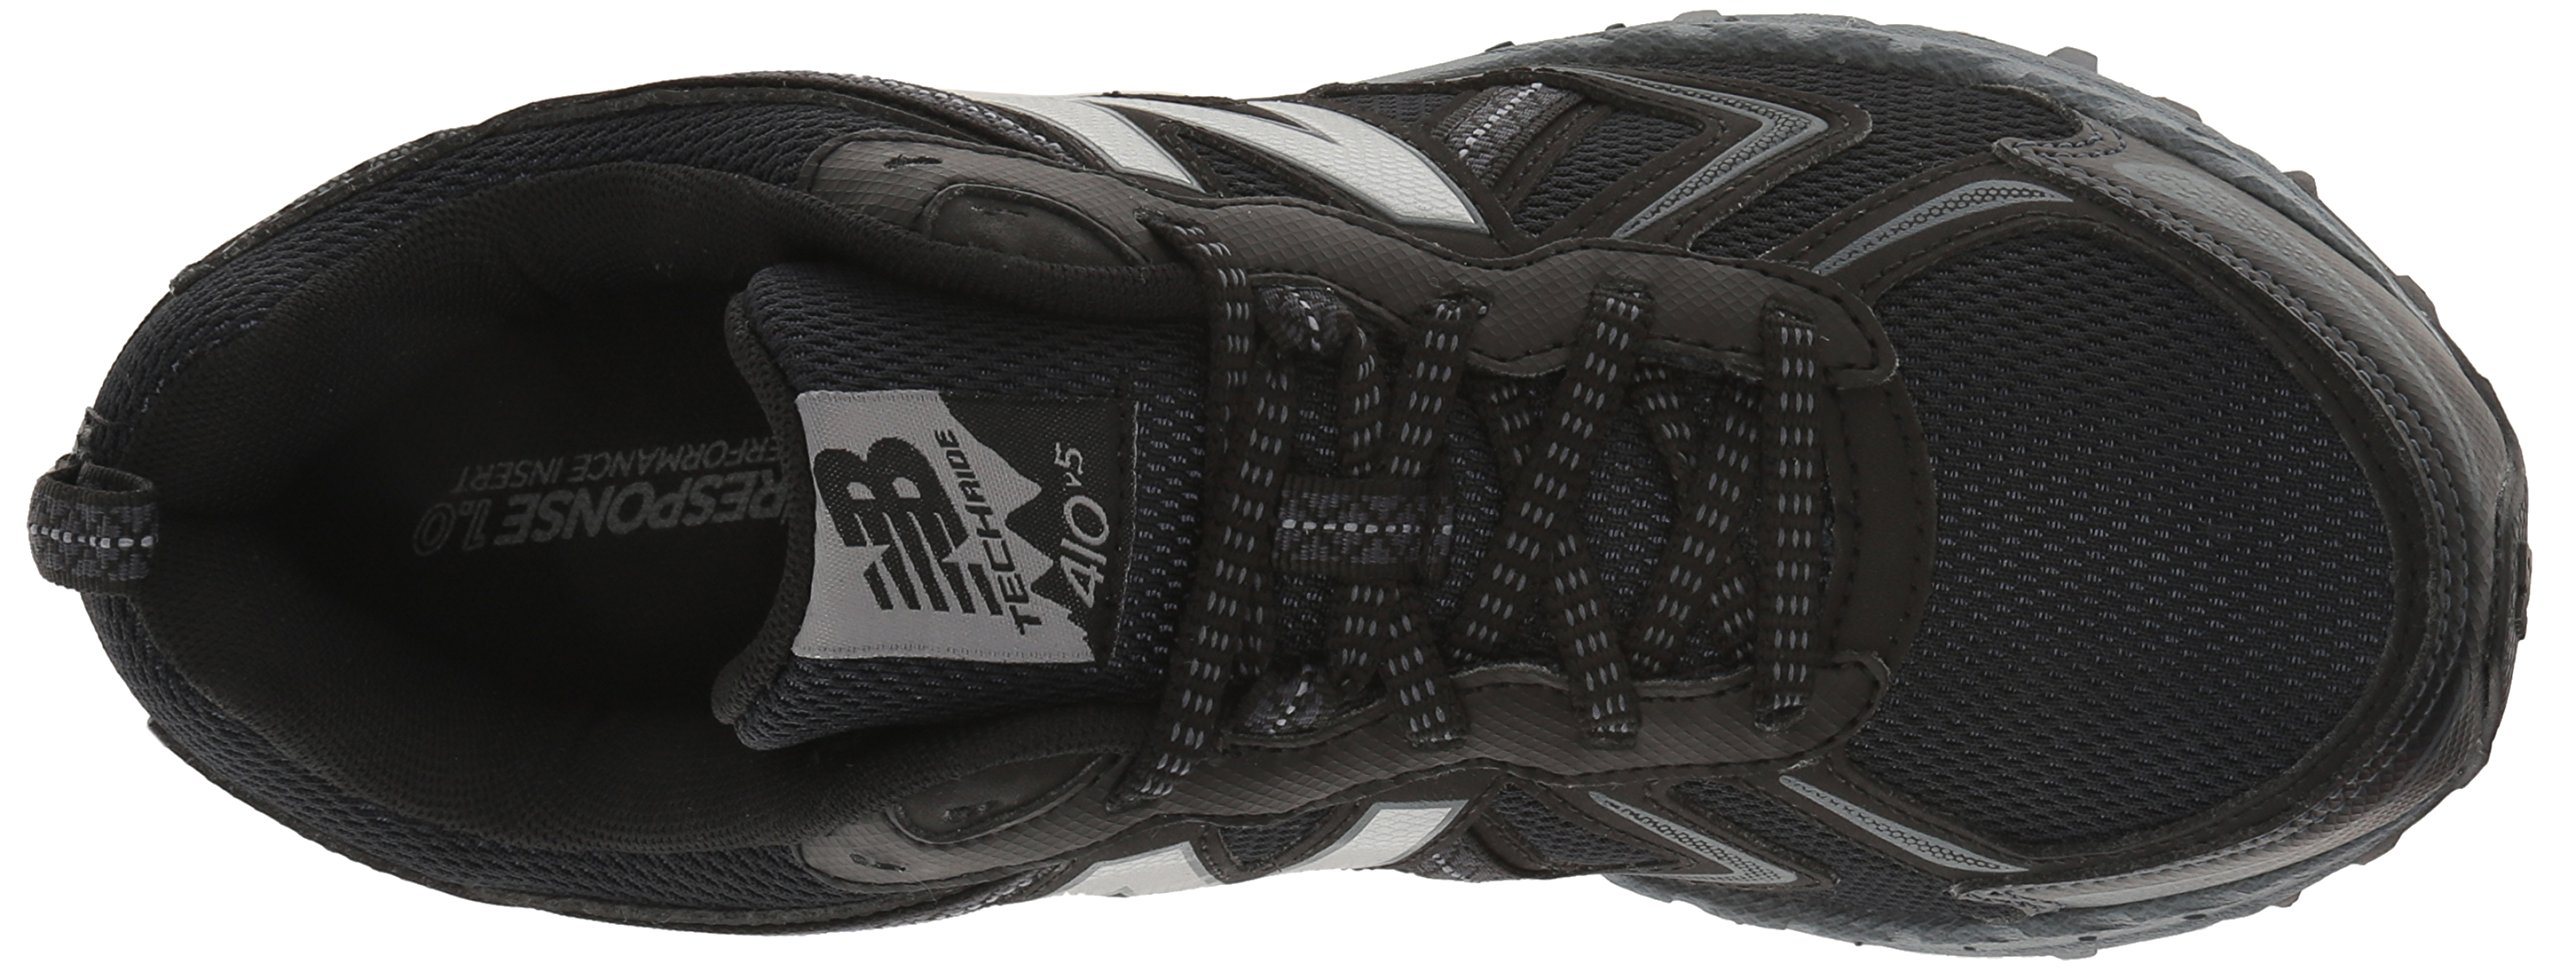 New Balance Men's MT410v5 Cushioning Trail Running Shoe, Black, 7 D US by New Balance (Image #8)